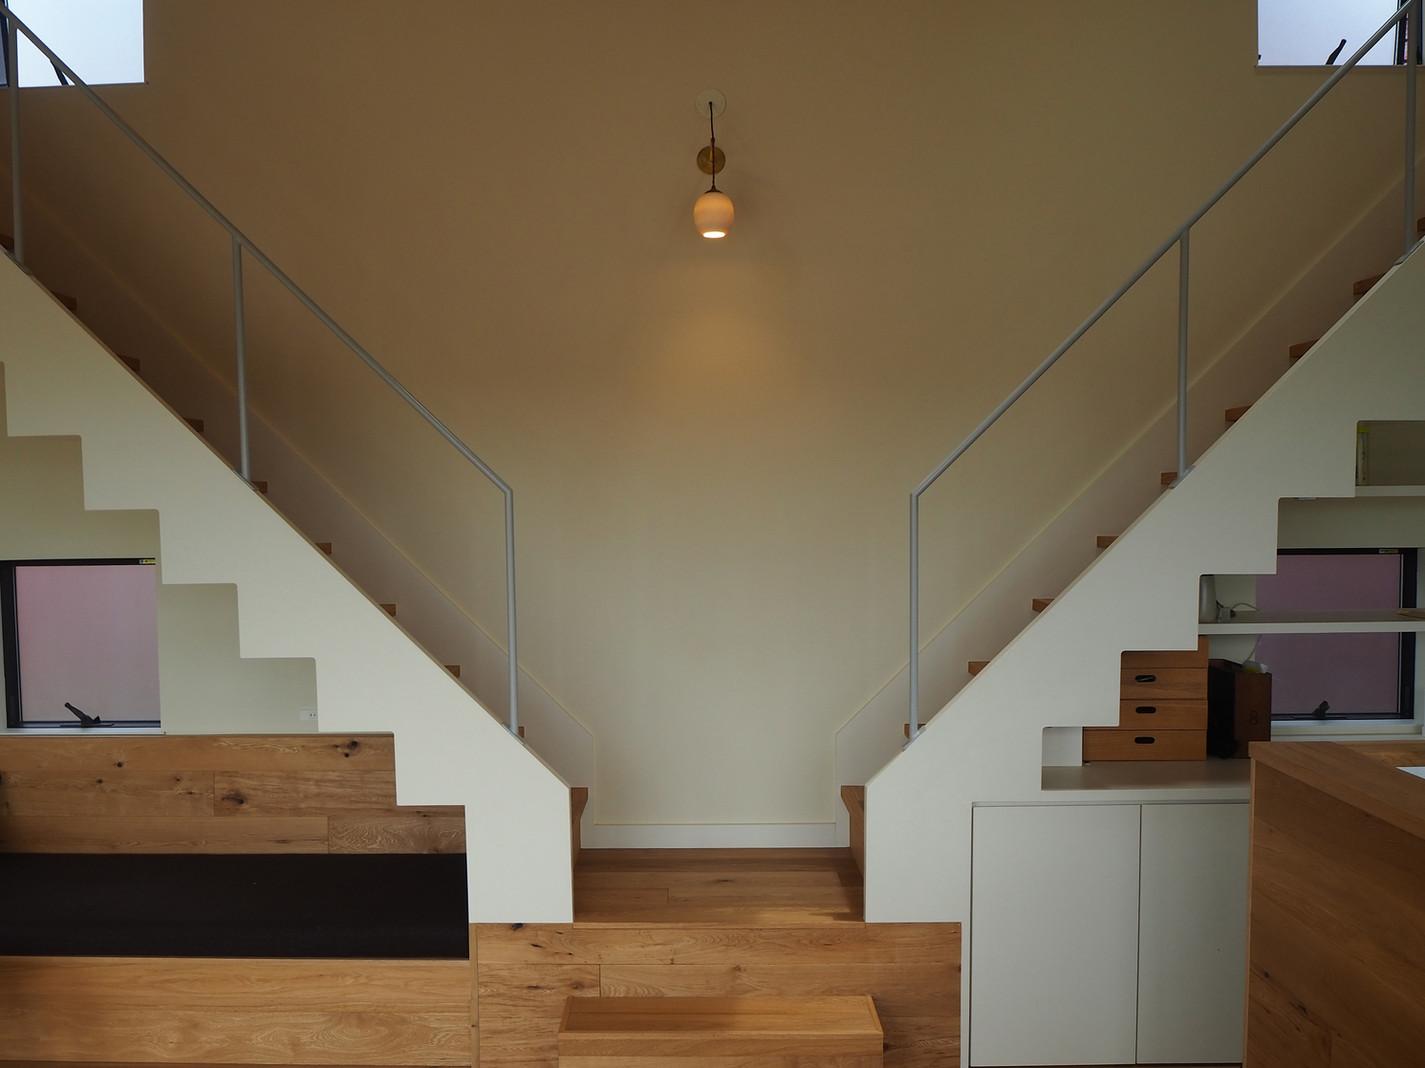 seino takashi design office & house 02_5